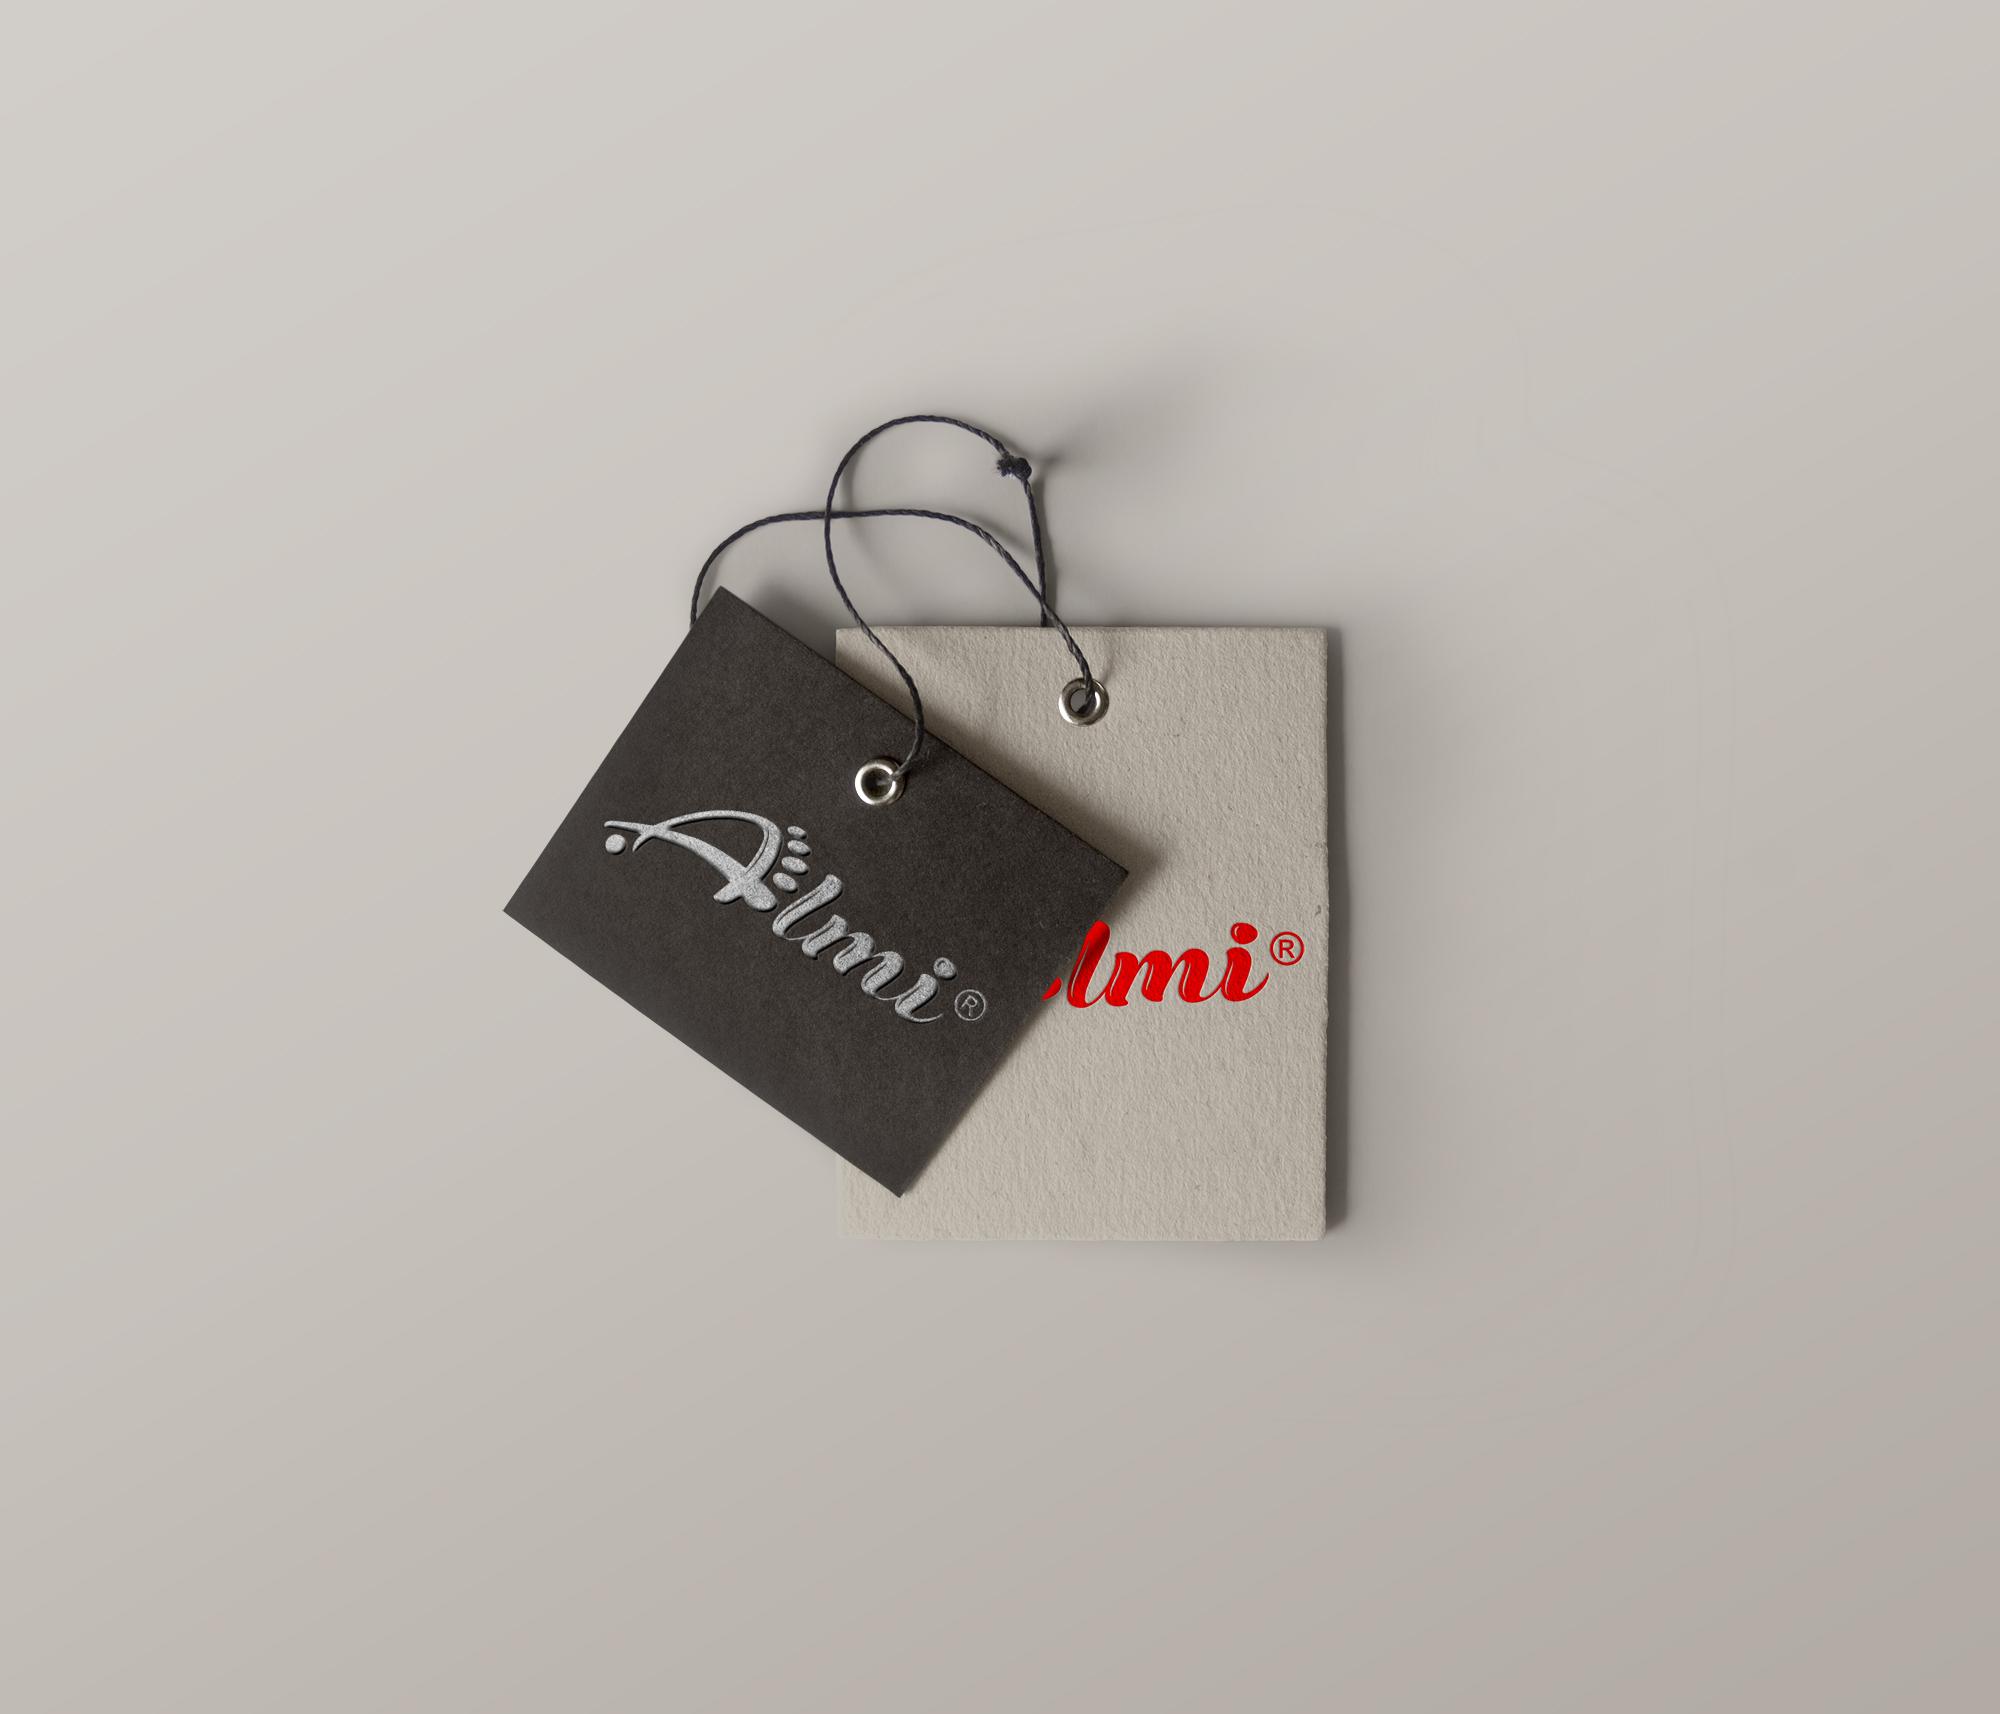 Дизайн логотипа обувной марки Алми фото f_94959f2e3f8be762.jpg